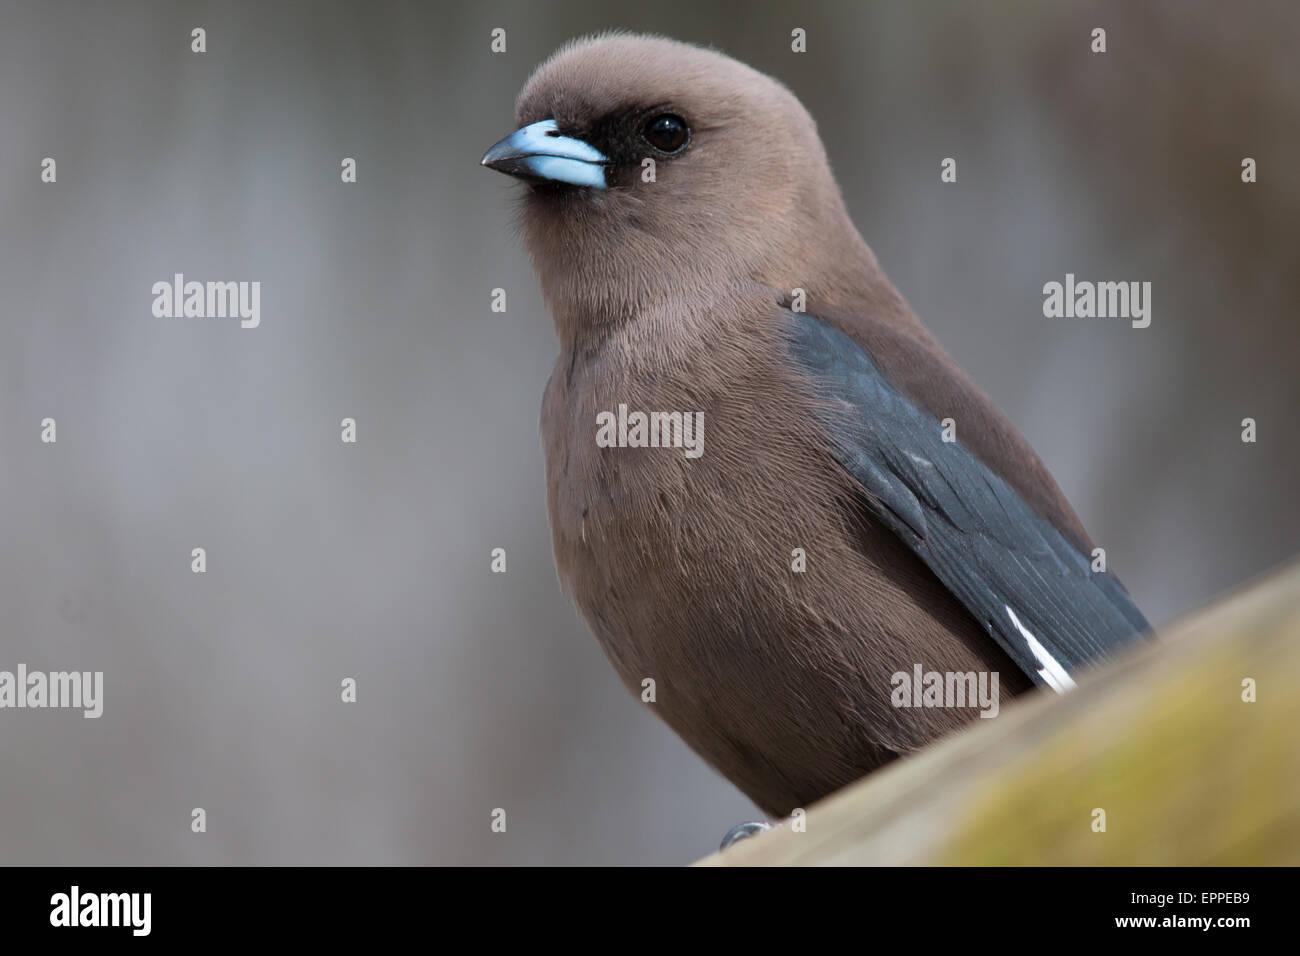 Dusky Woodswallow (Artamus cyanopterus) - Stock Image